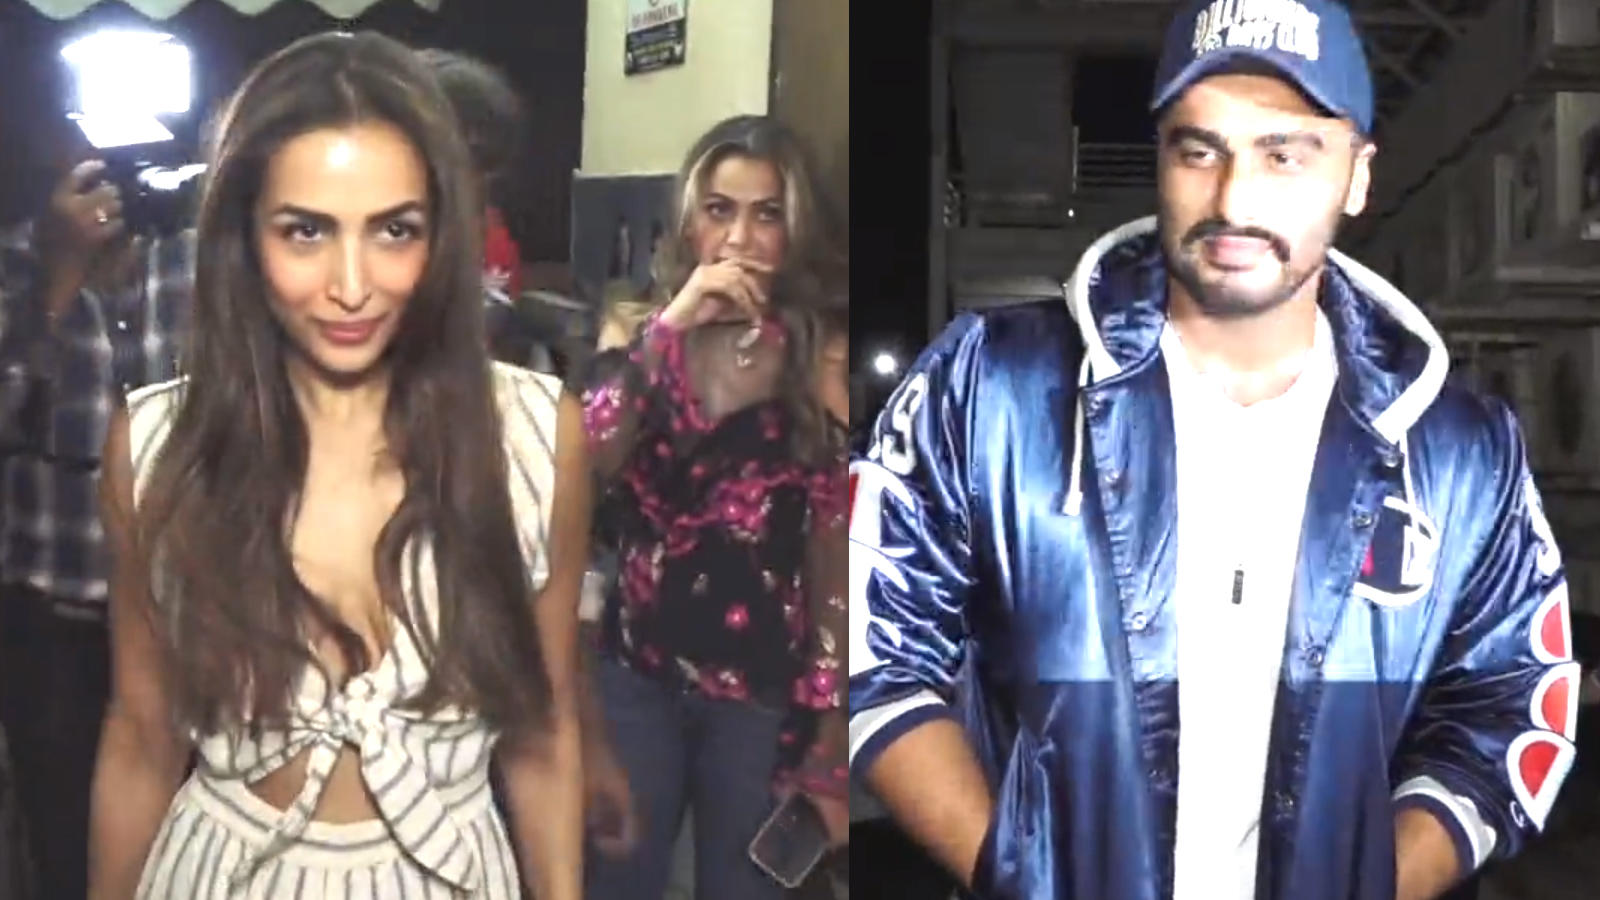 Malaika Arora and Arjun Kapoor arrive separately  for a movie screening